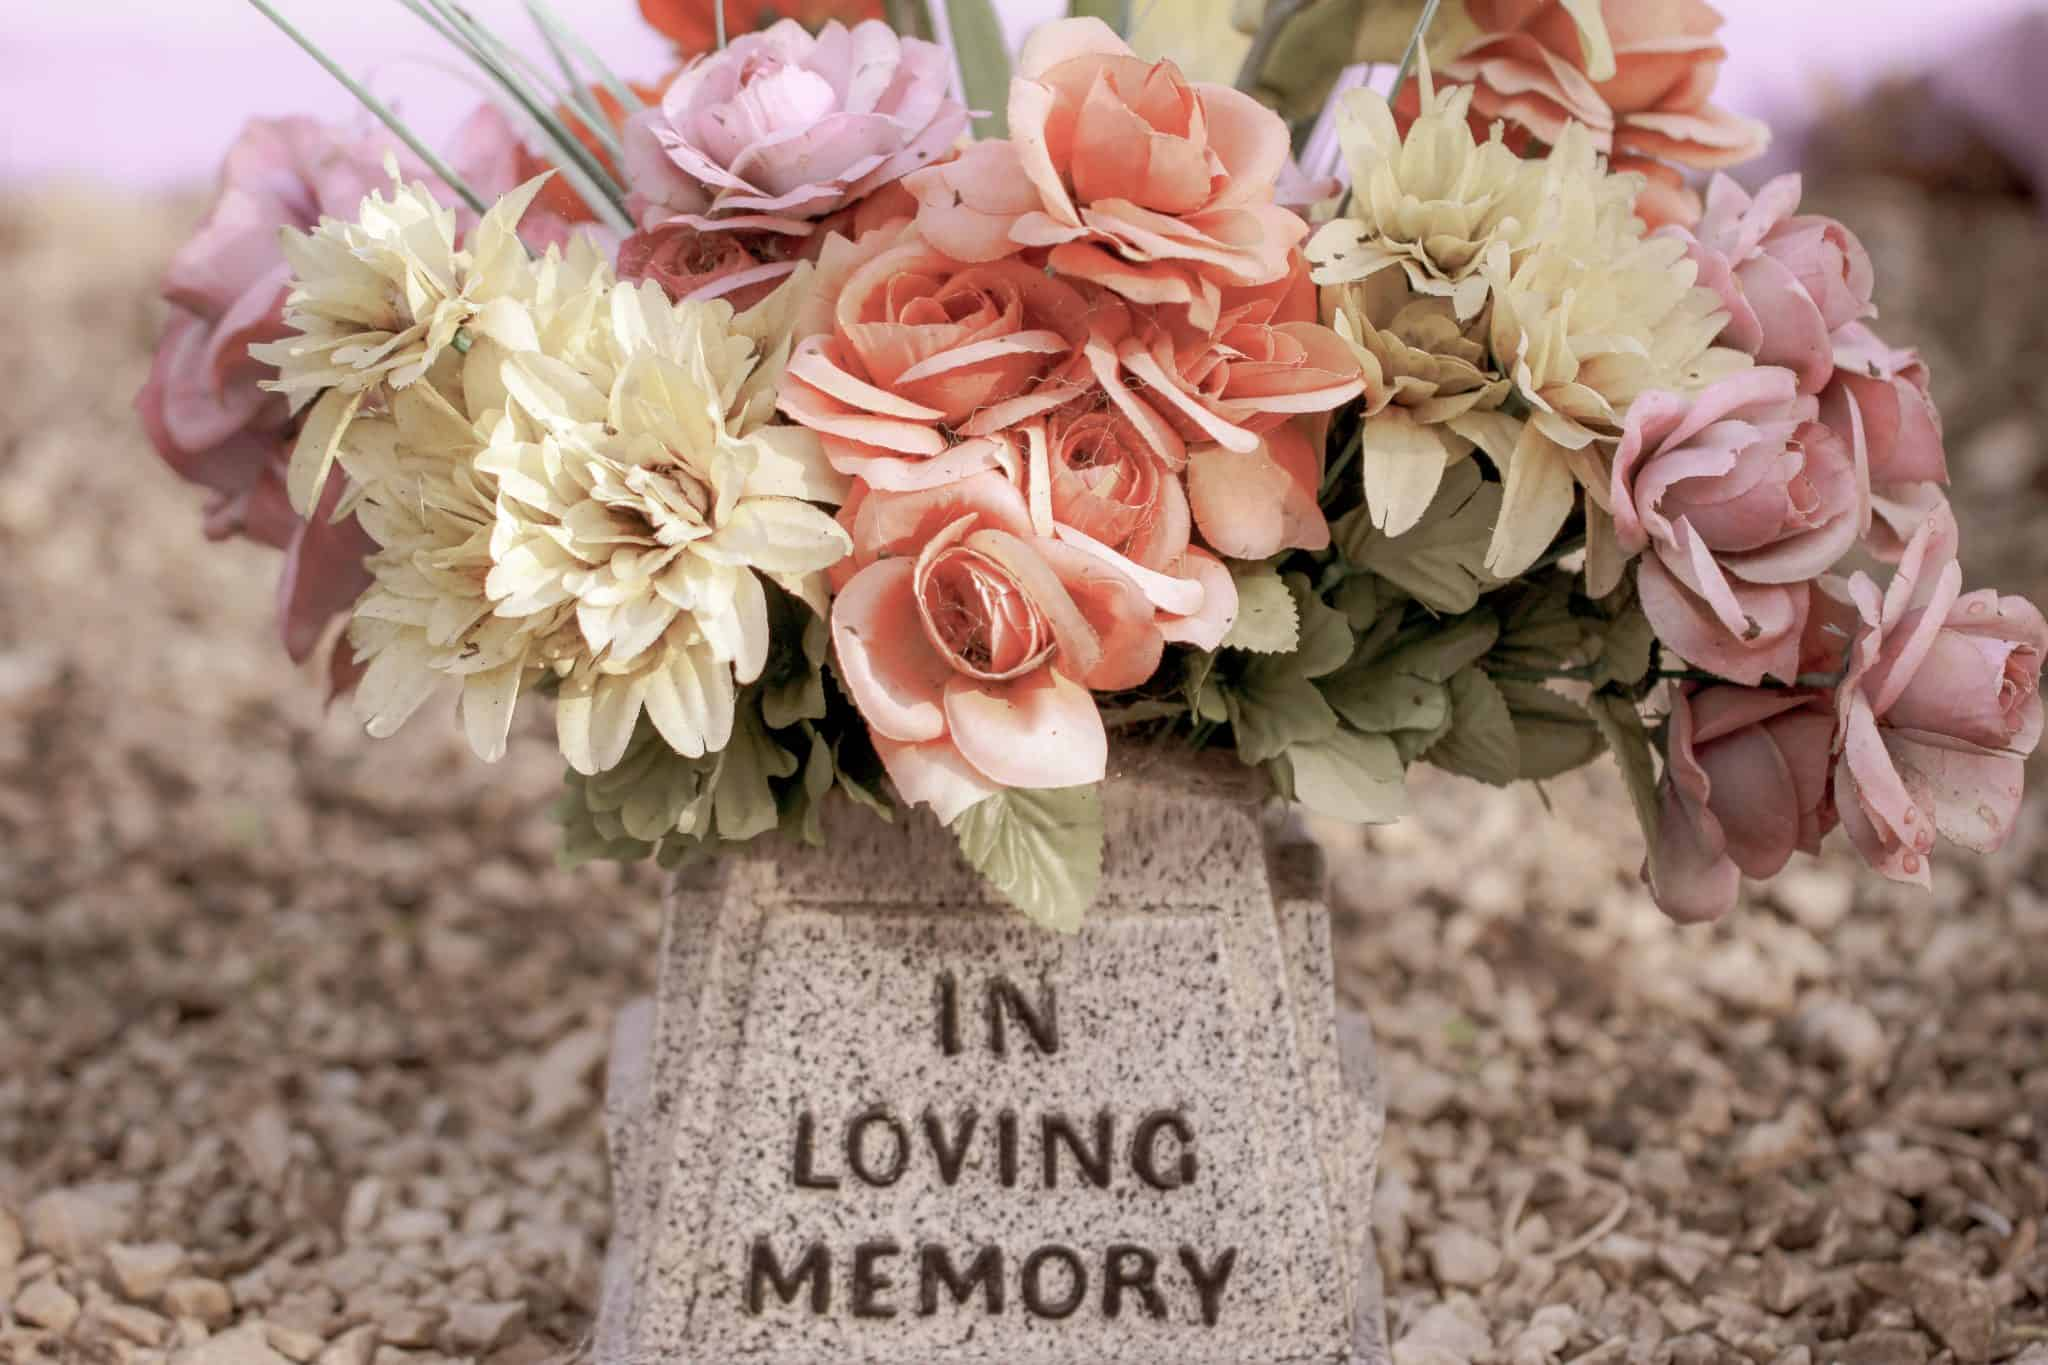 In Loving Memory memorial with flowers